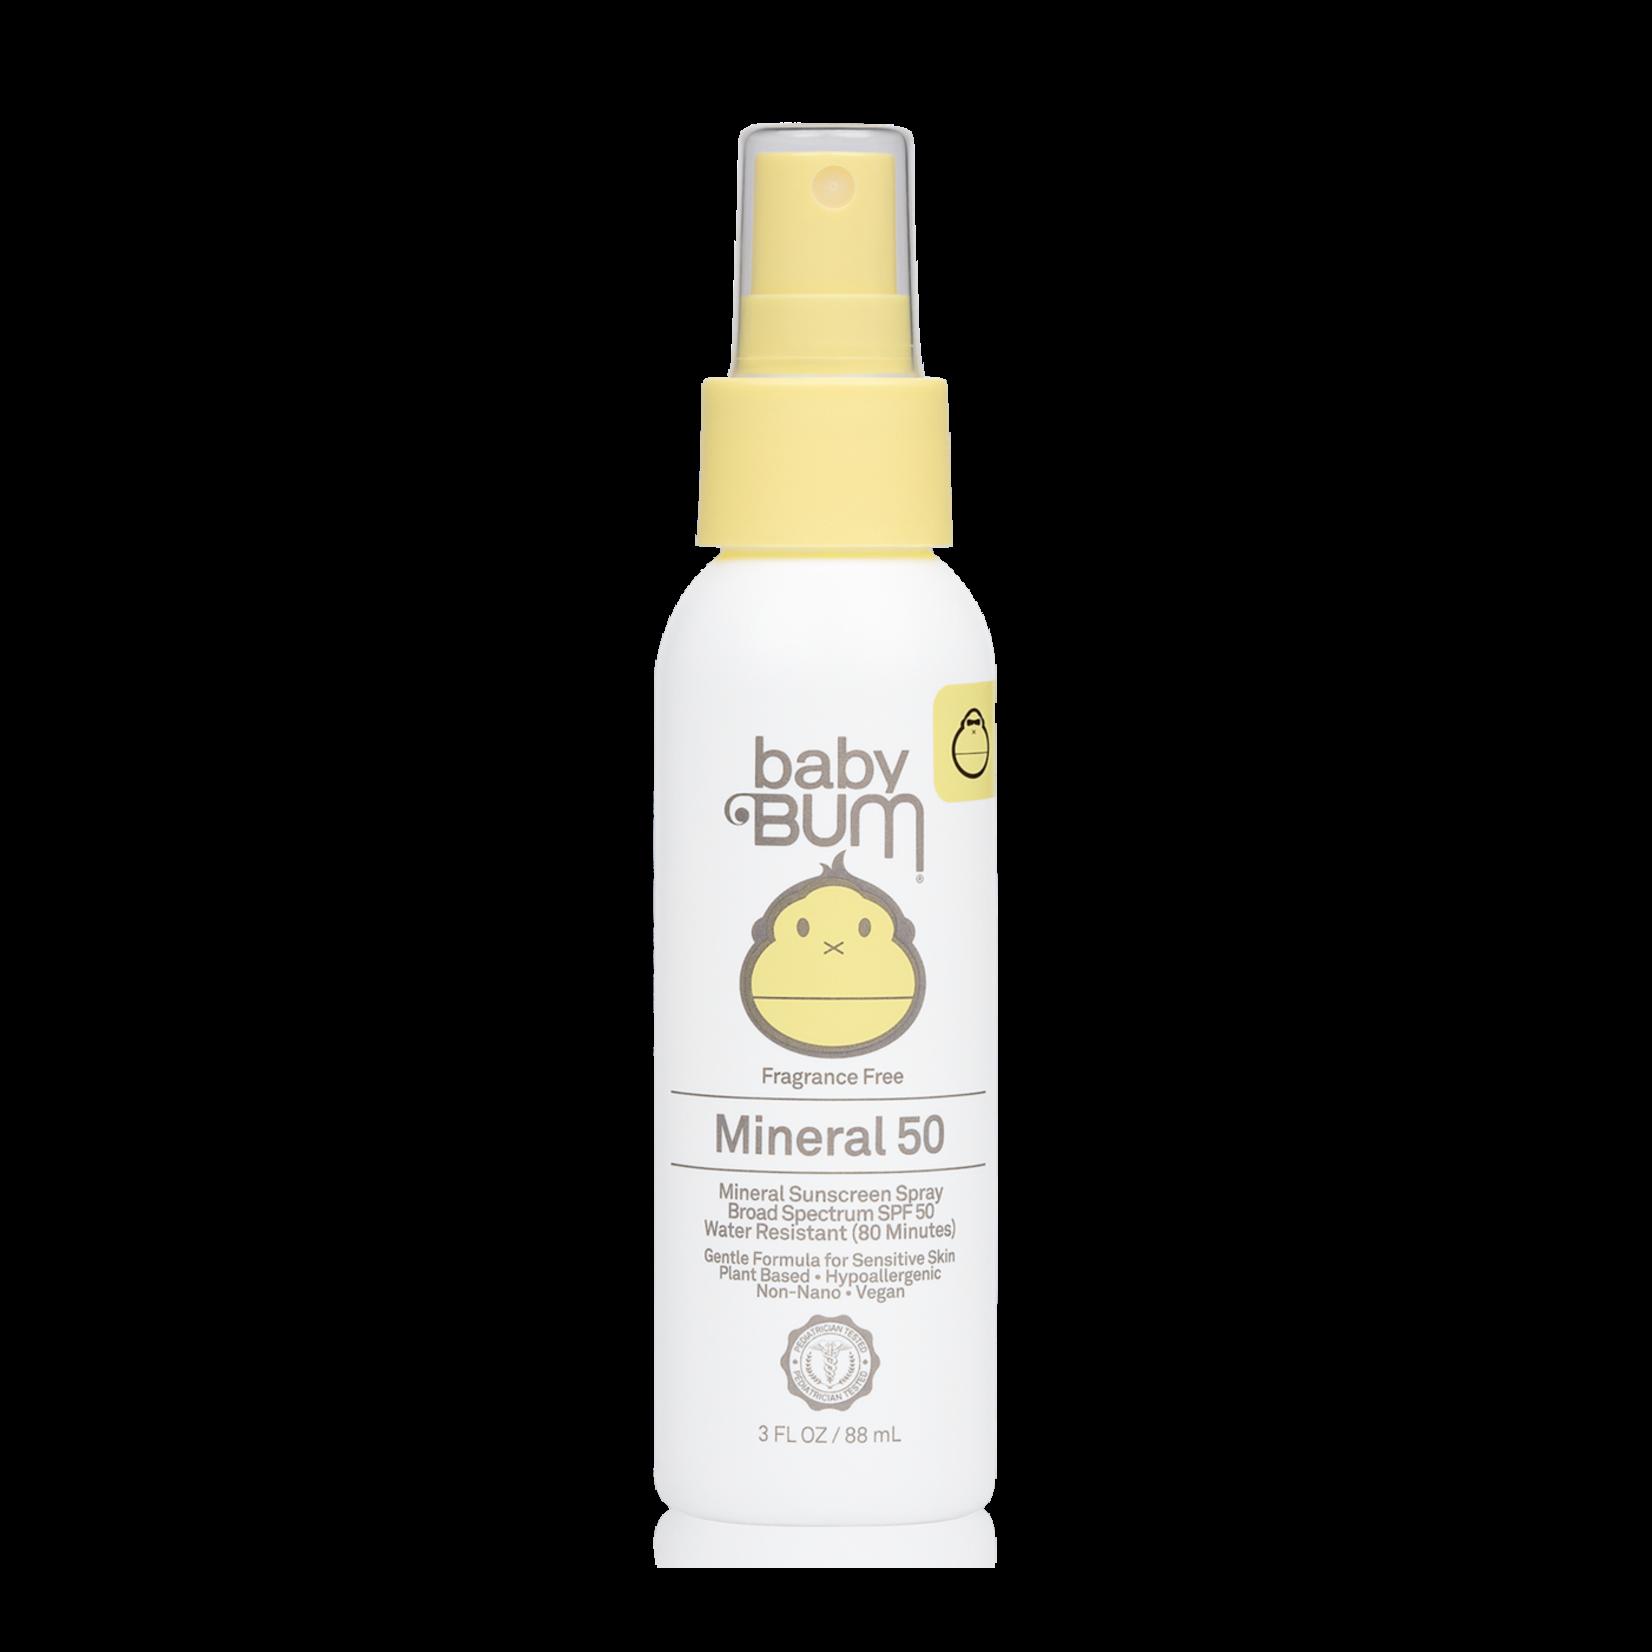 Sun Bum Sun Bum Baby Bum Spf 50 Mineral Sunscreen  Spray - Fragrance Free 3 Oz